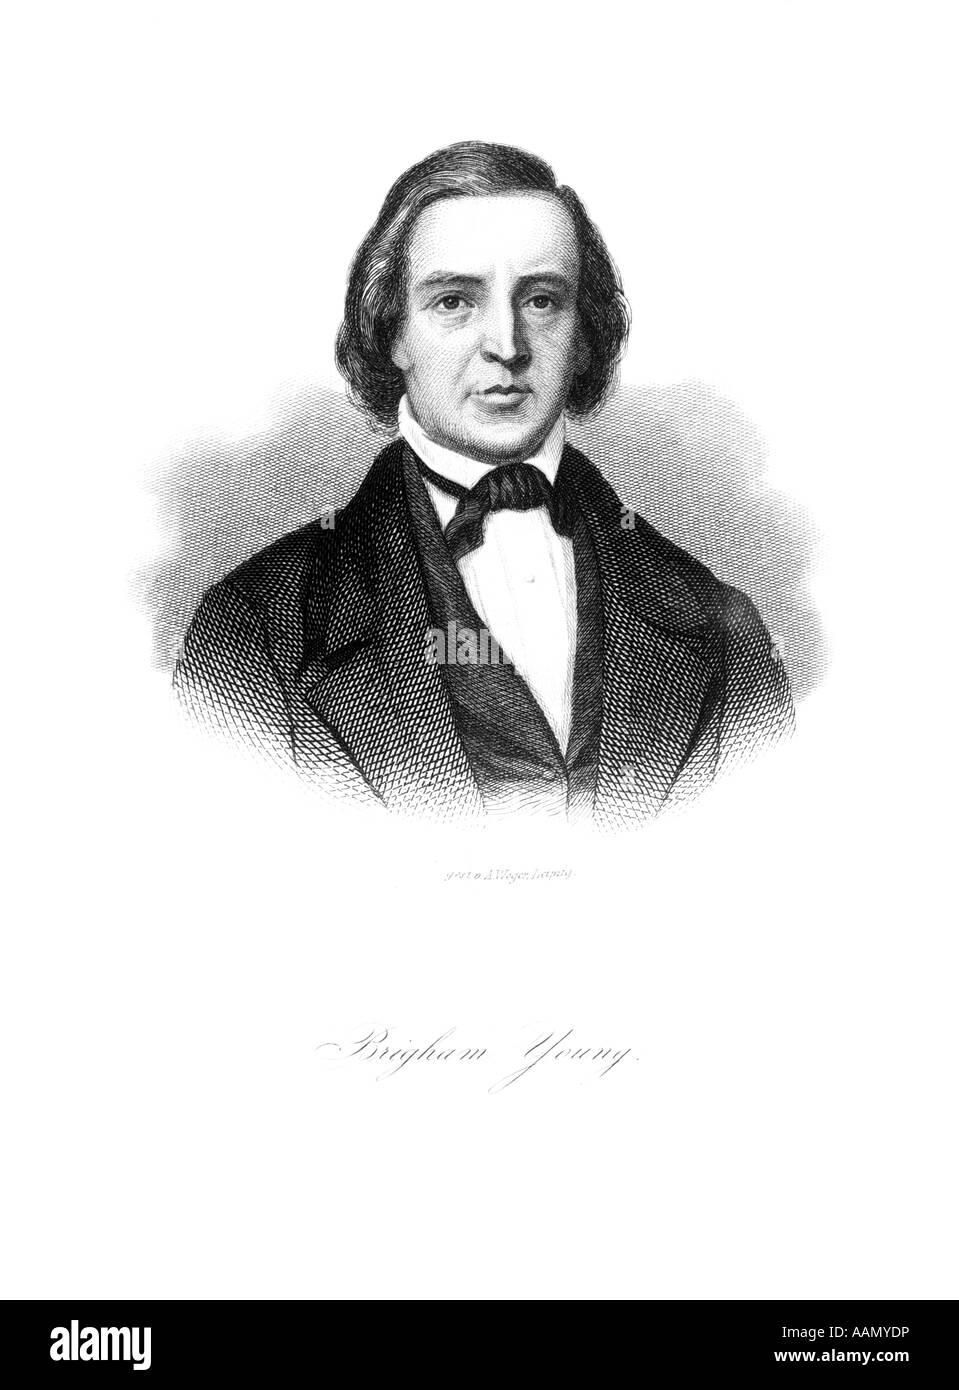 PORTRAIT BRIGHAM YOUNG 1801 - 1877 MORMON RELIGIOUS LEADER LED EMIGRANTS WEST SETTLED UTAH SALT LAKE CITY Stock Photo